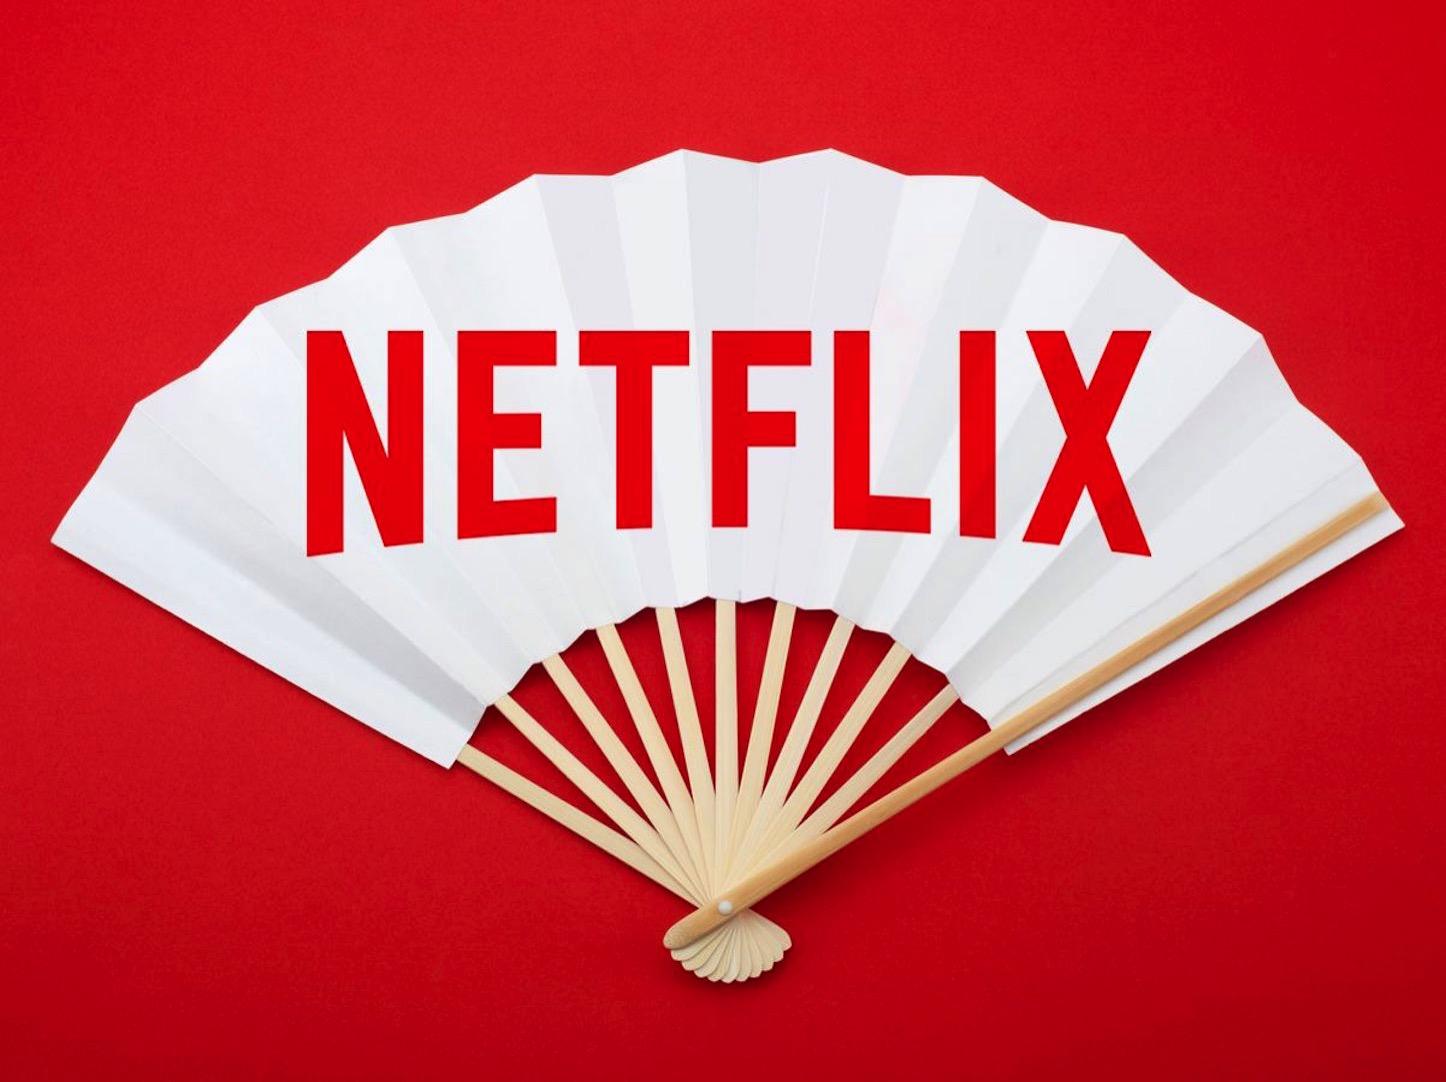 Netflix Coming To Japan